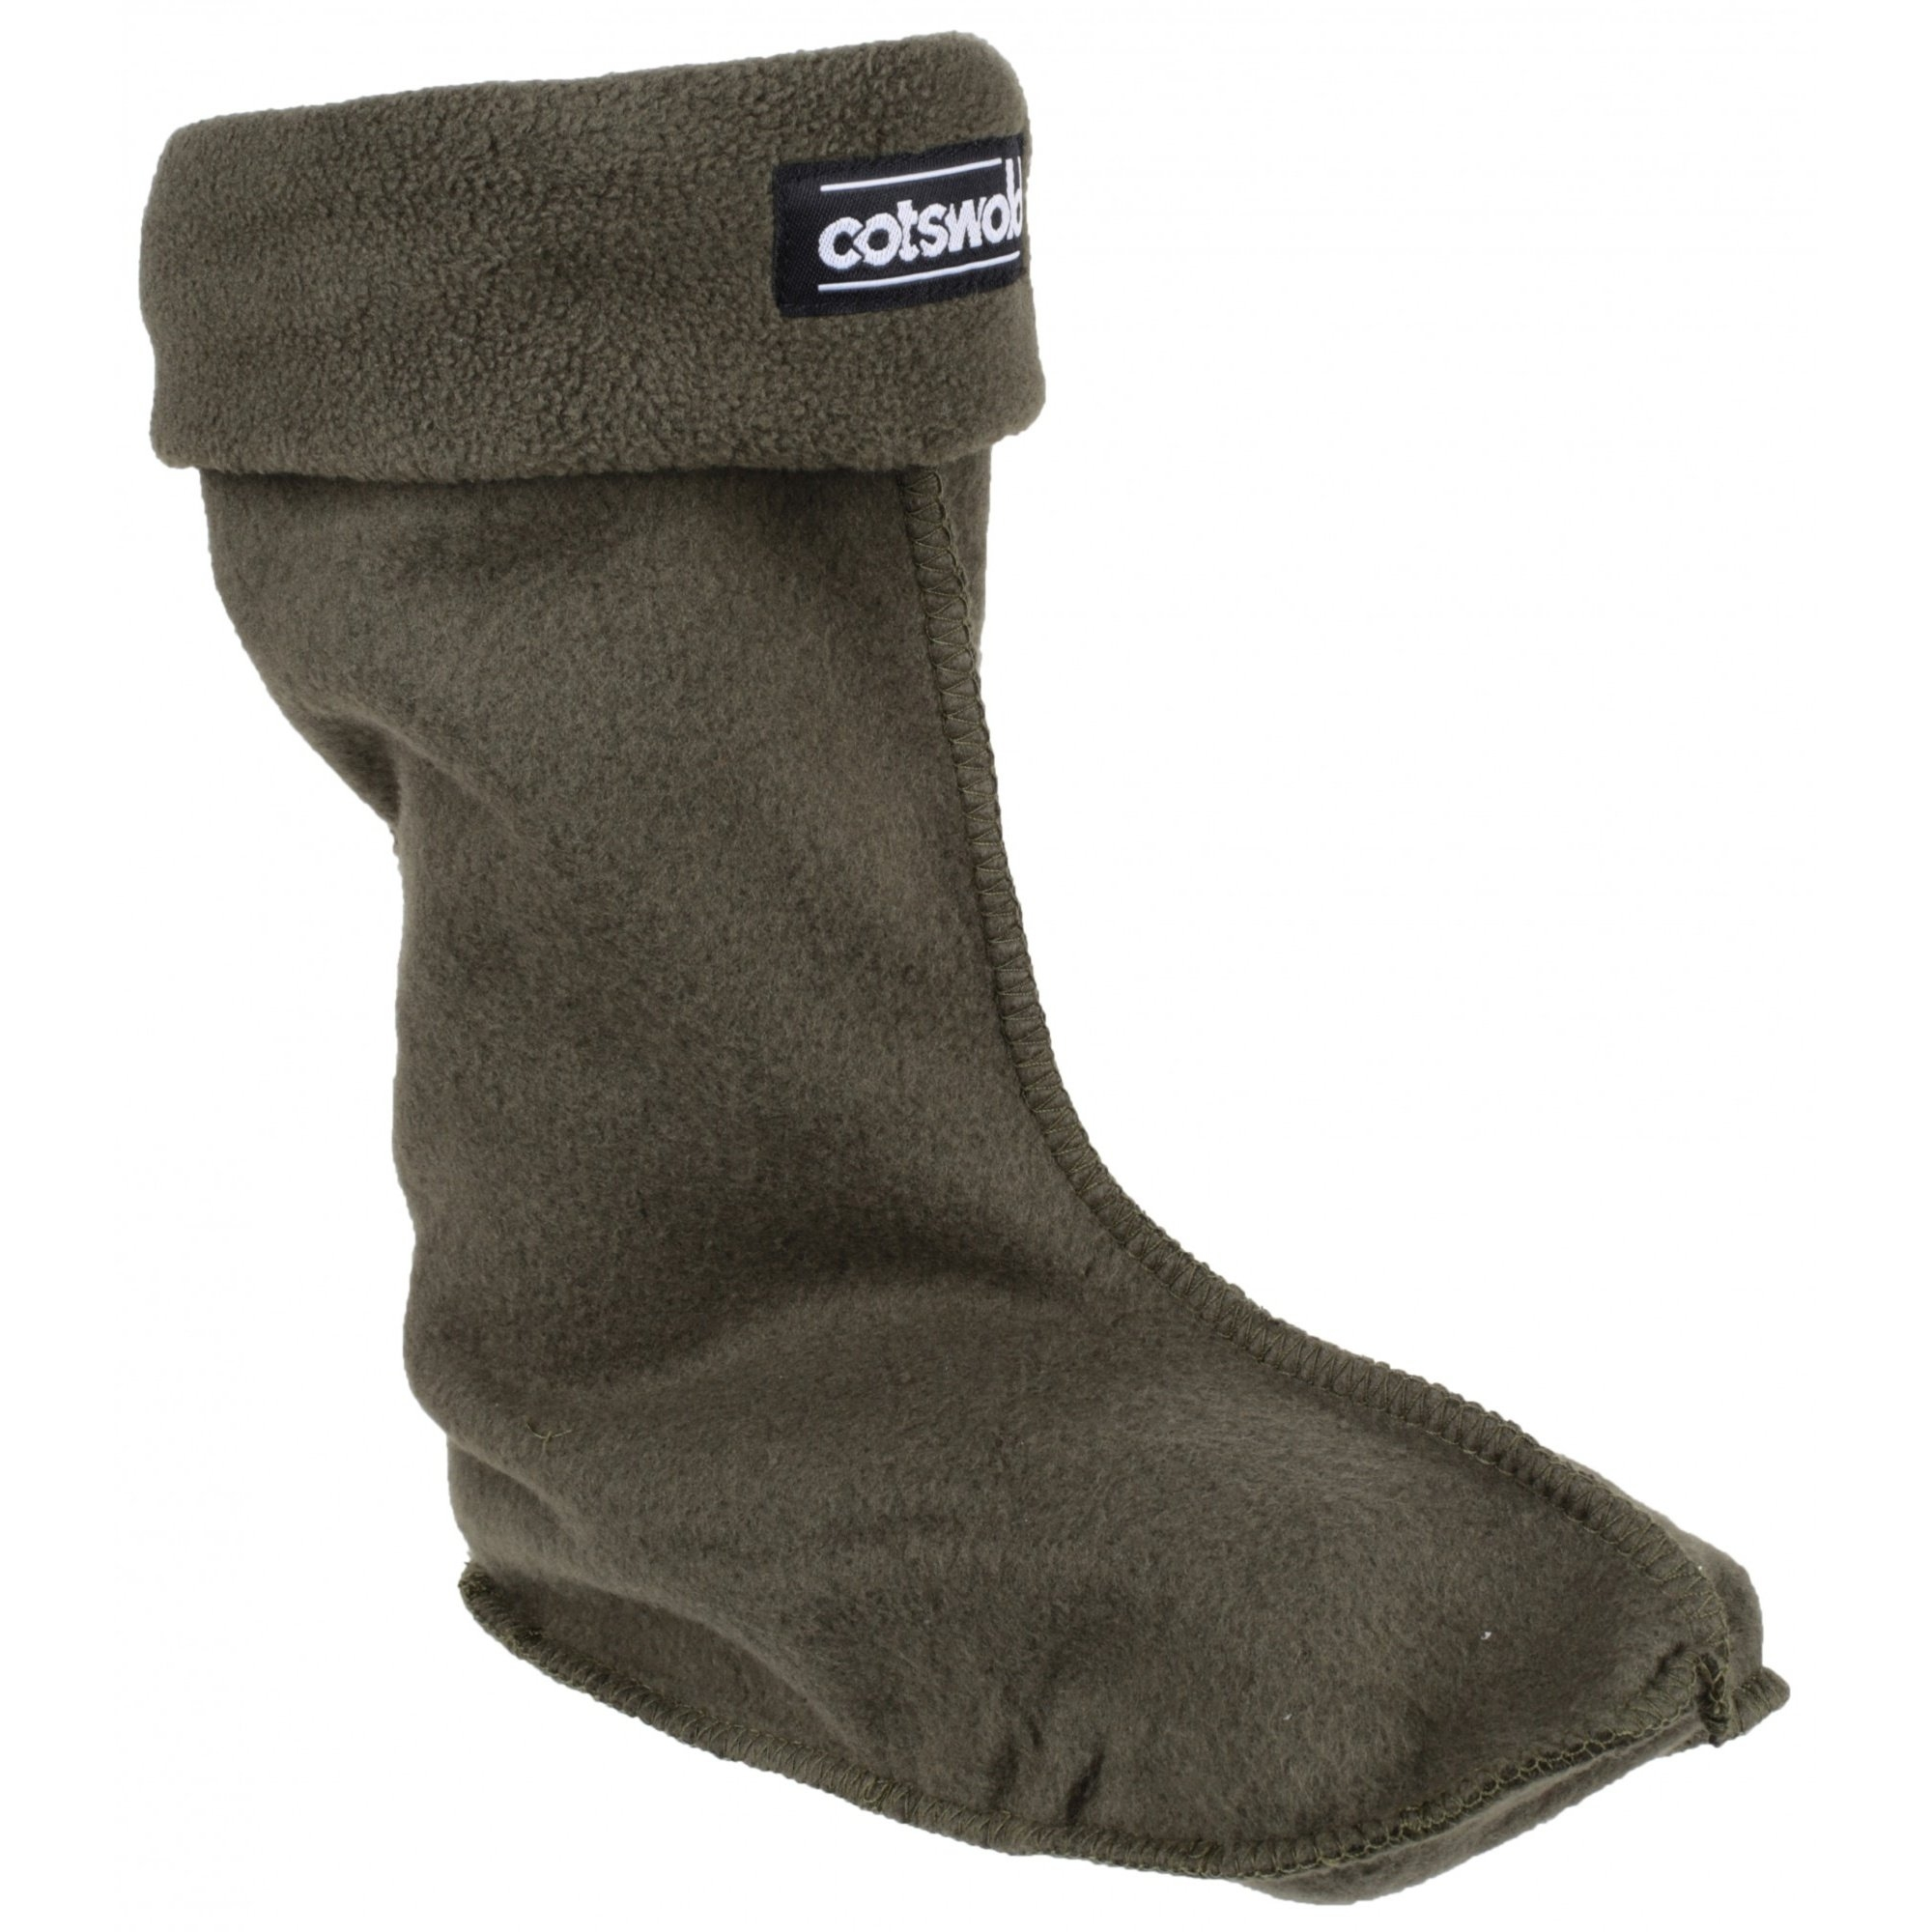 Cotswold lange sokken nu online bestellen